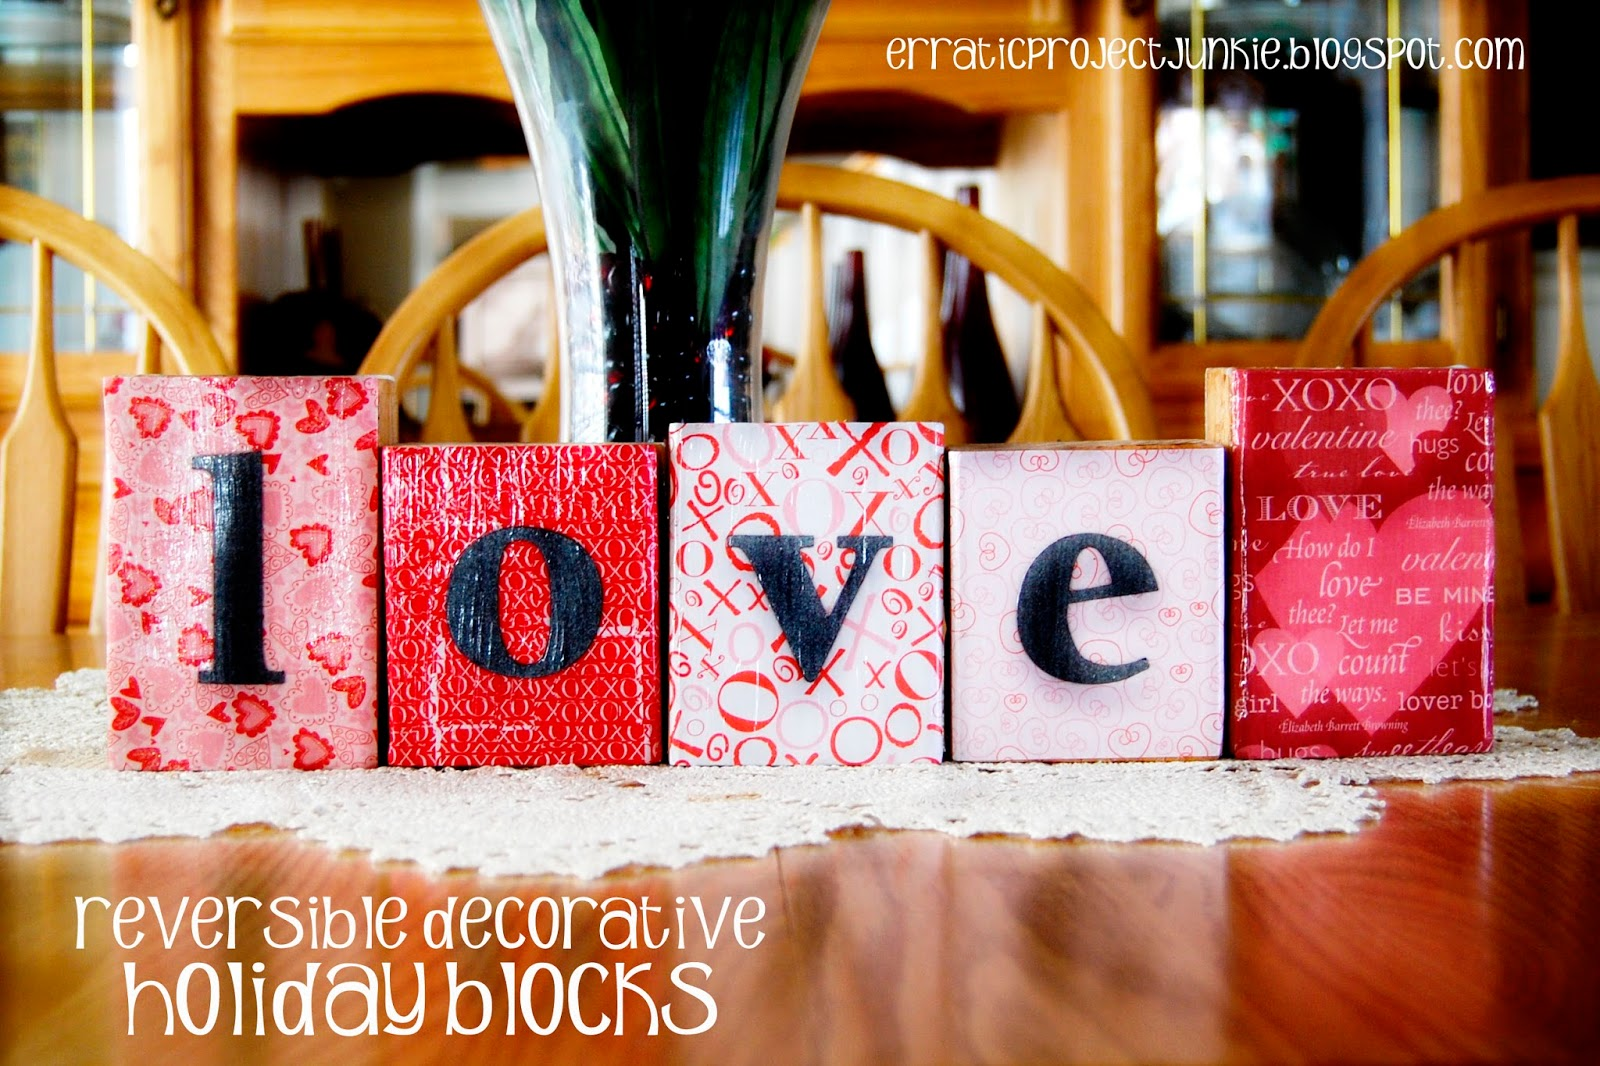 how to break down camphor blocks